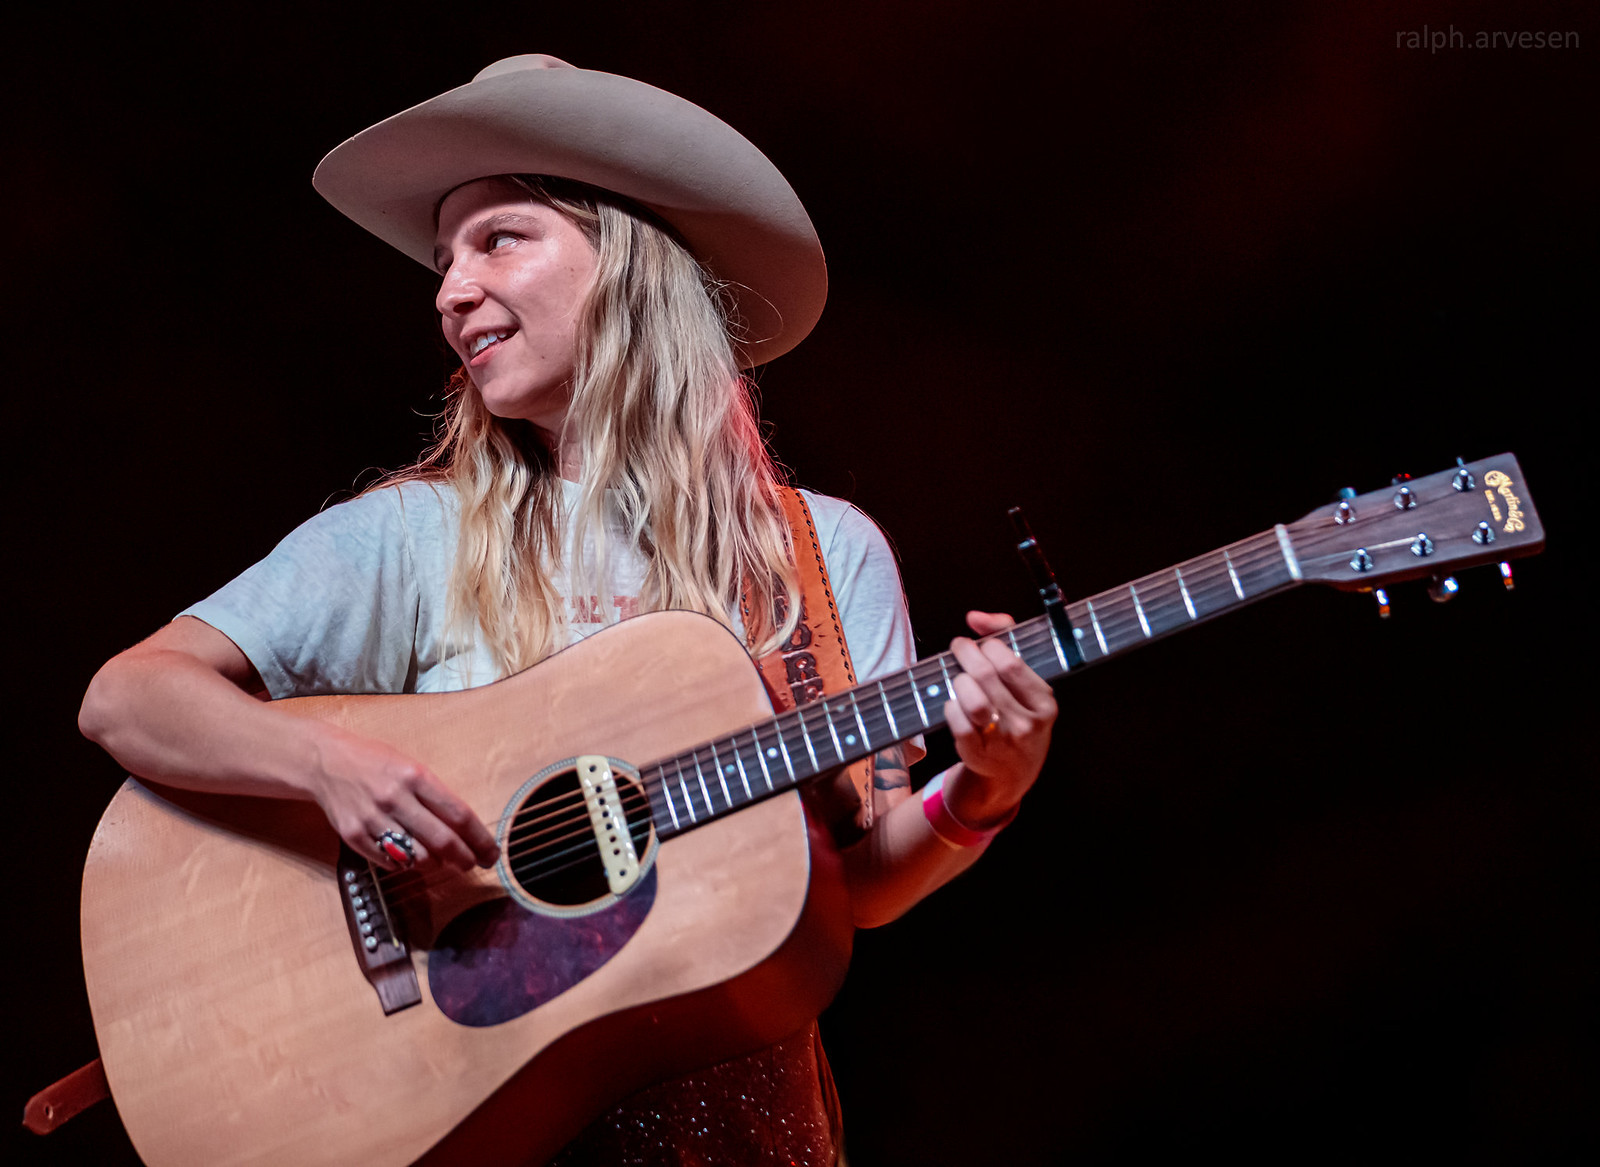 Kathryn Legendre | Texas Review | Ralph Arvesen